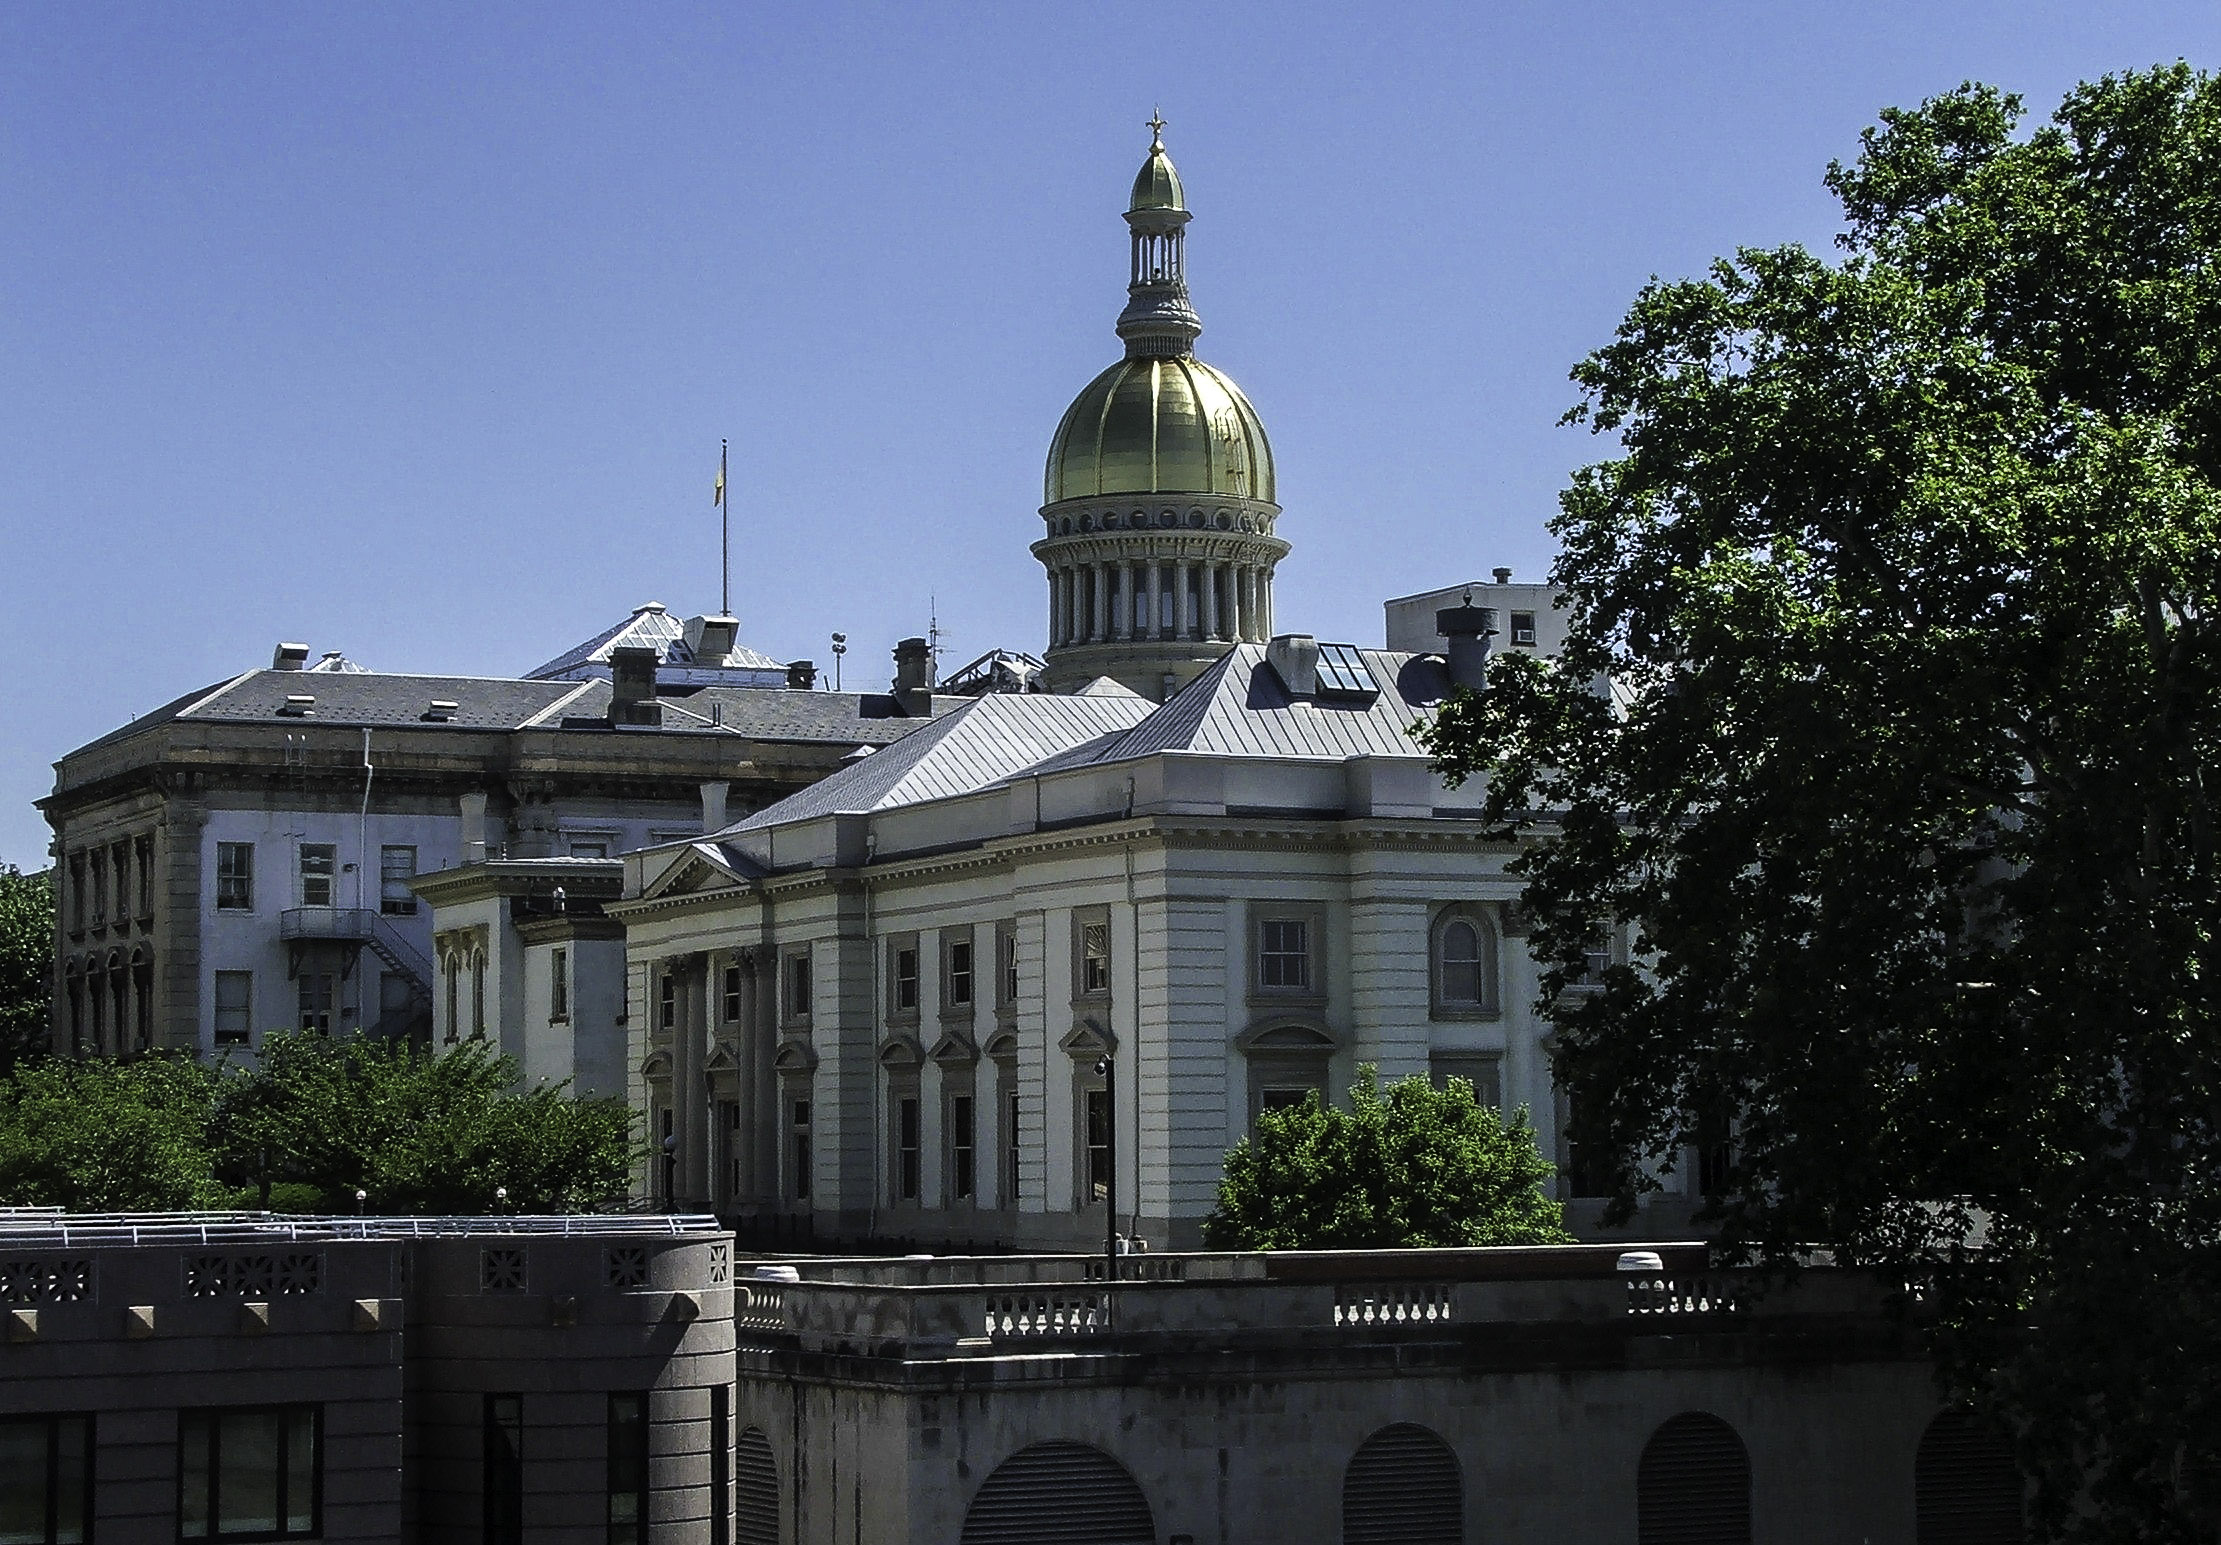 NJ Statehouse